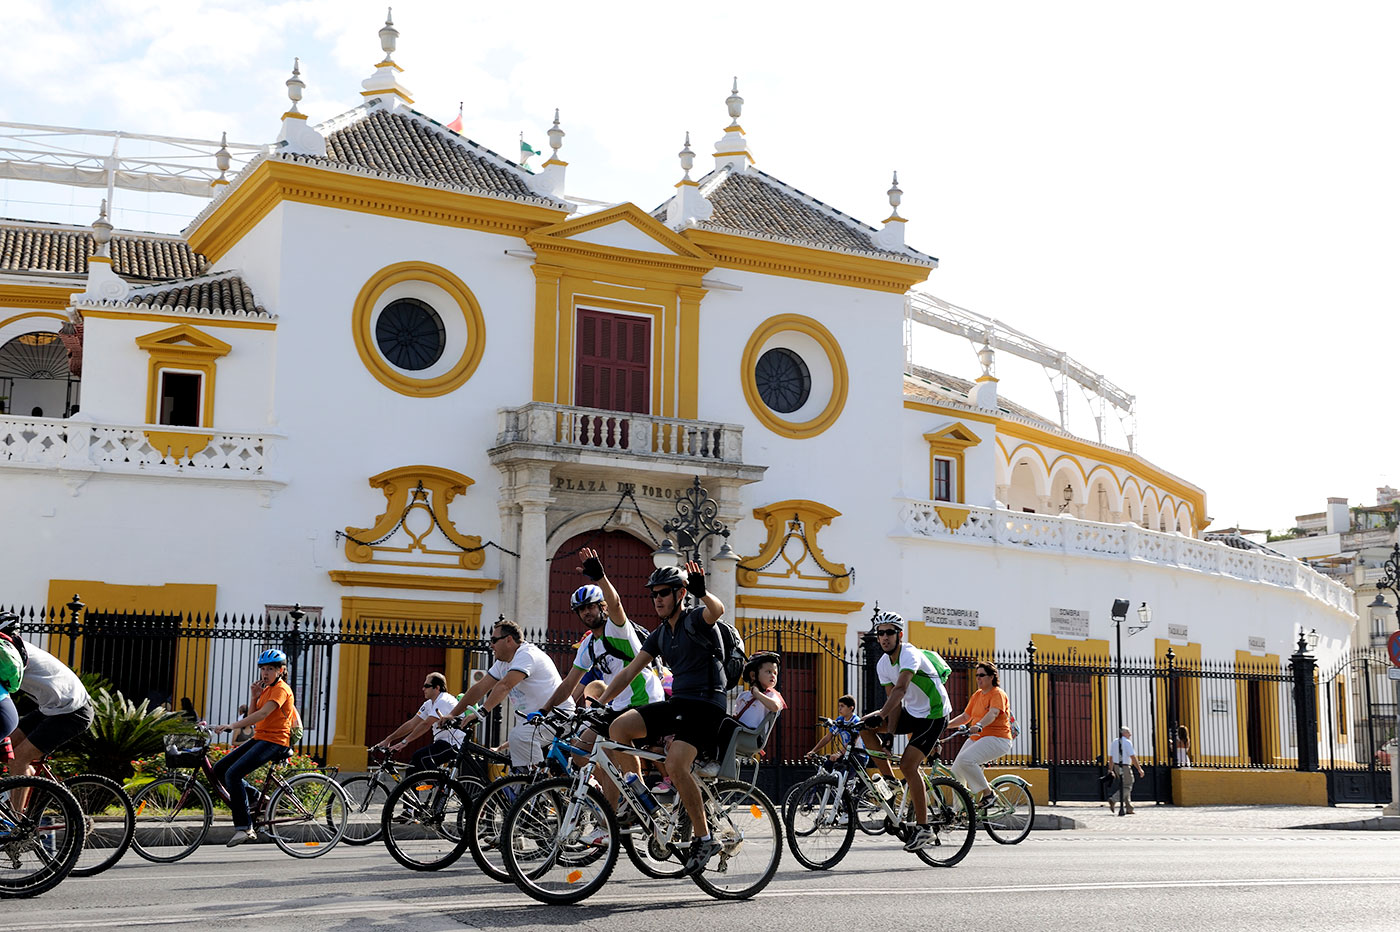 ciclistas paseo colon sevilla frente plaza toros (foto consorcio turismo sevilla